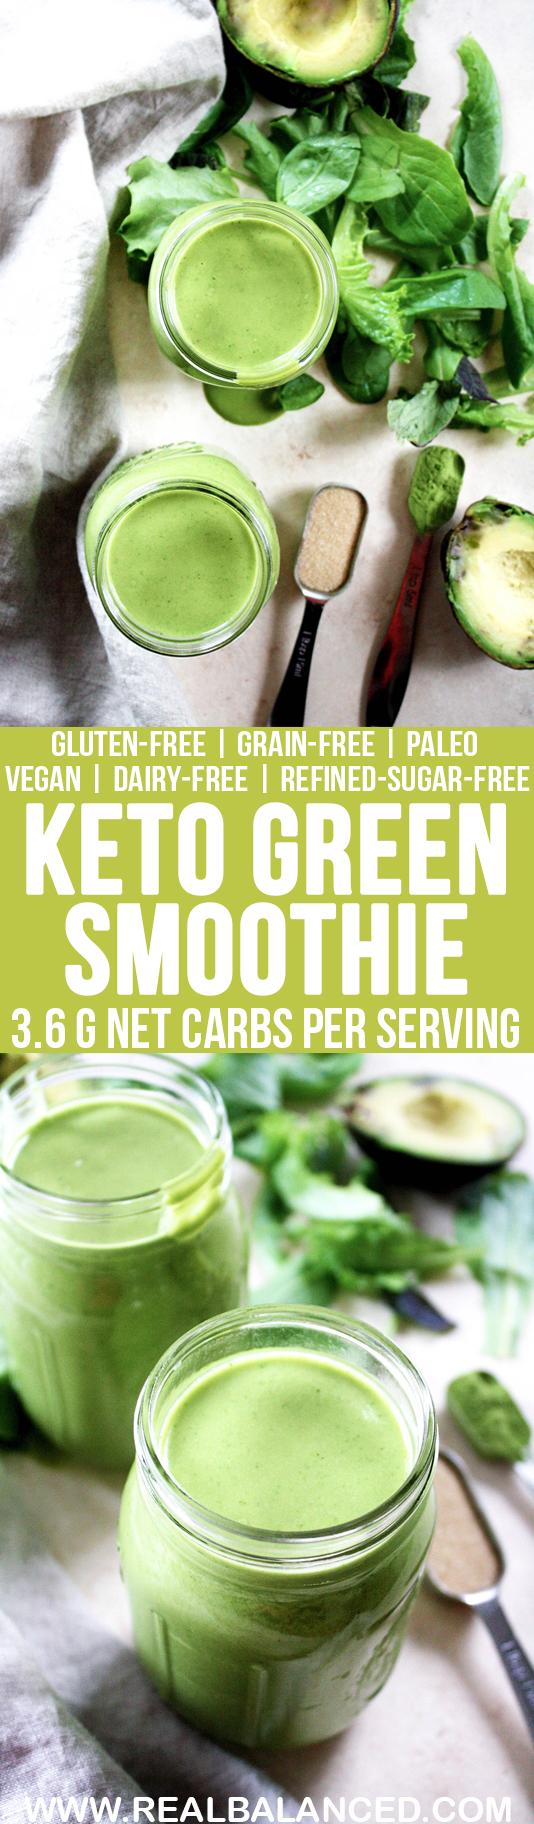 Keto Green Smoothie: keto, low-carb, paleo, low-glycemic, gluten-free, grain-free, dairy-free, vegetarian, vegan, & refined-sugar-free; 3.6g net carbs per serving!